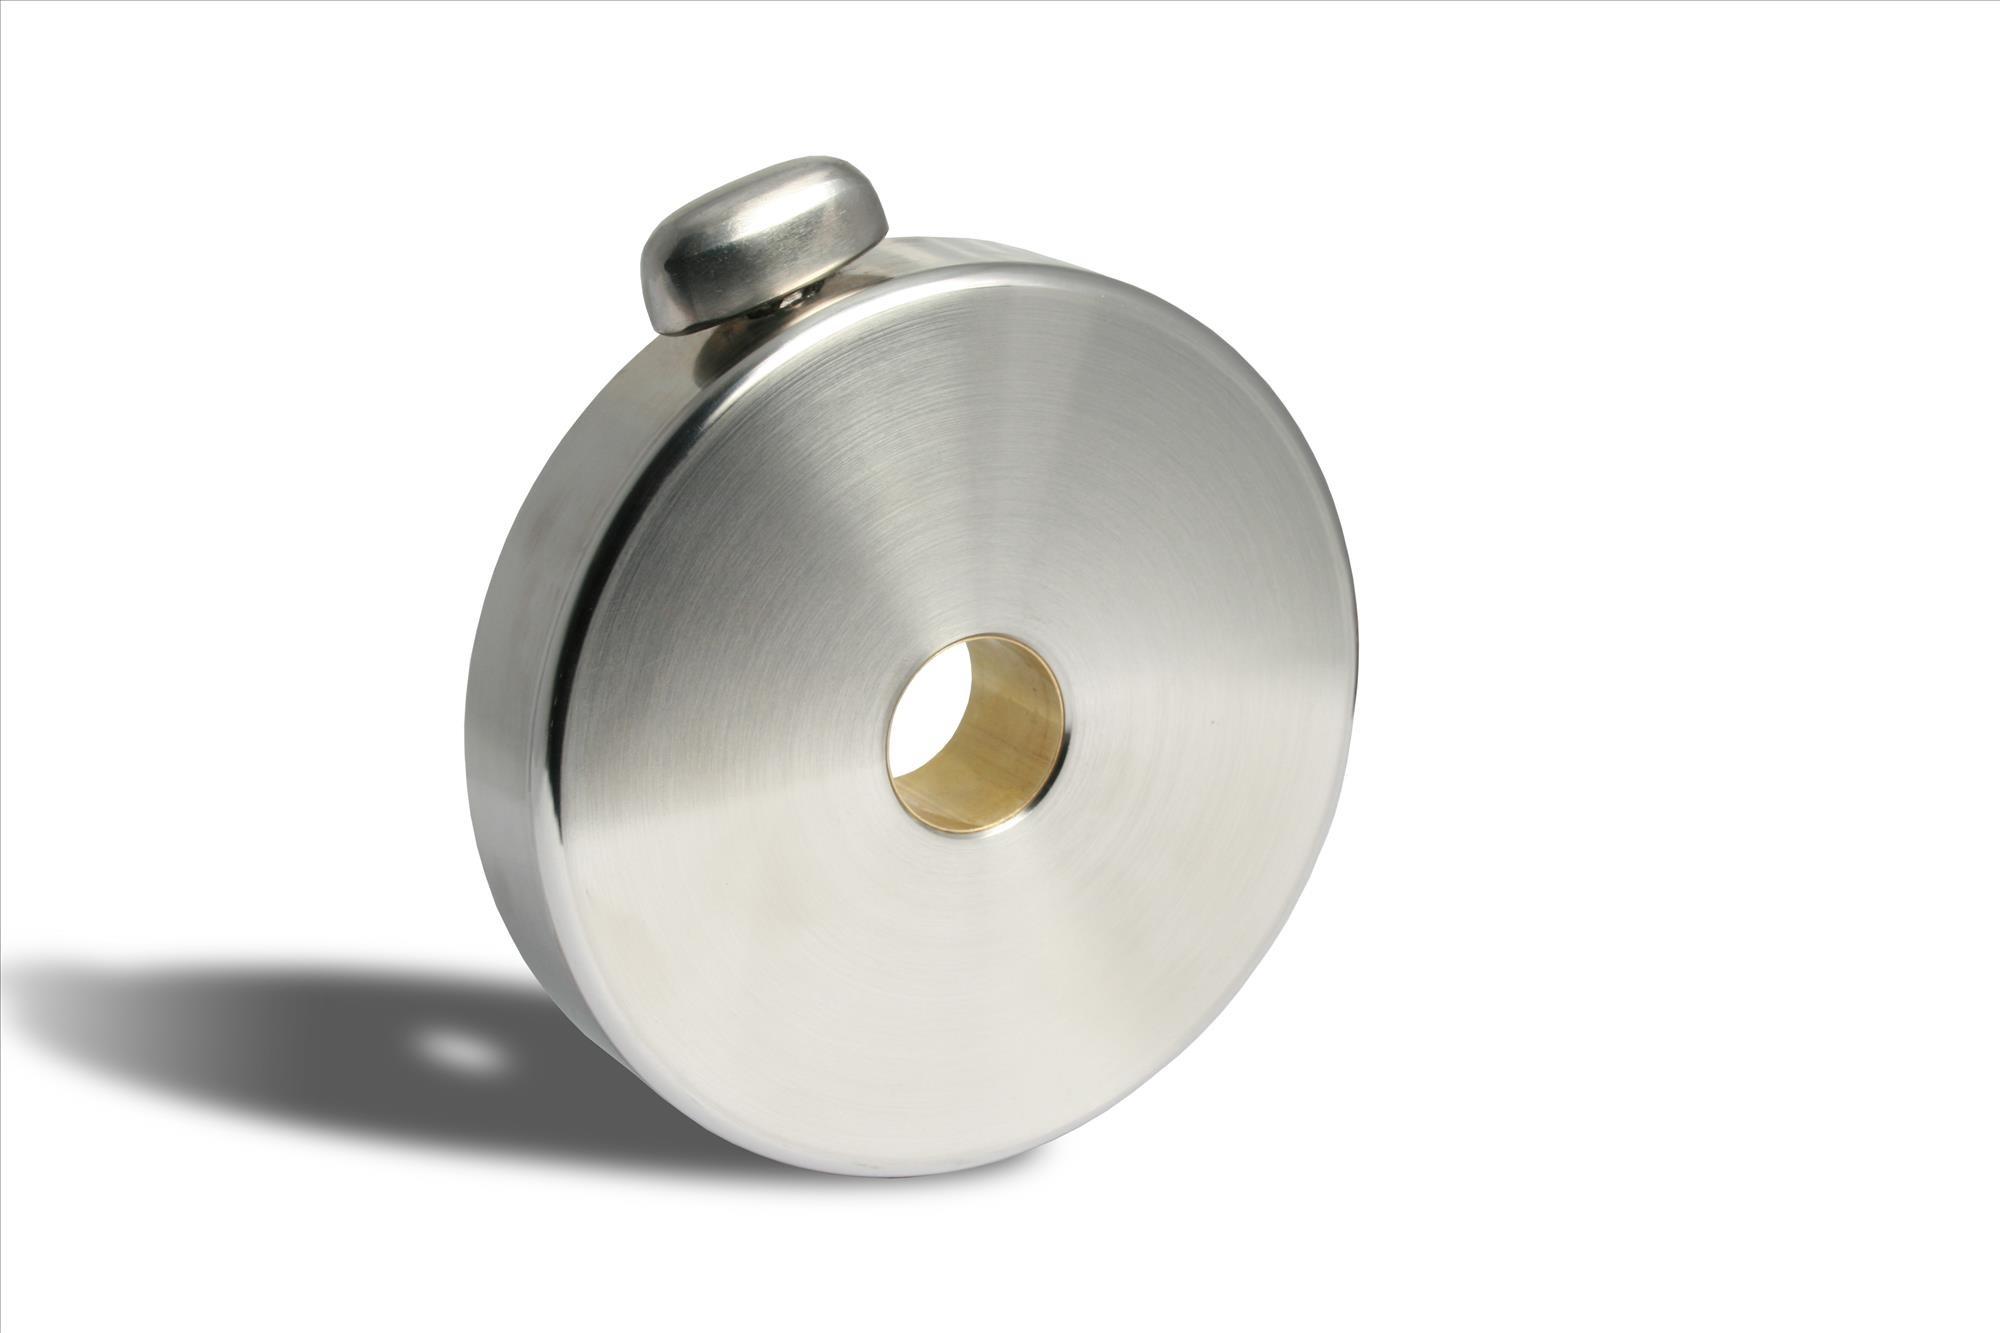 3kg Gegengewicht Ø 30mm aus V2A-Stahl